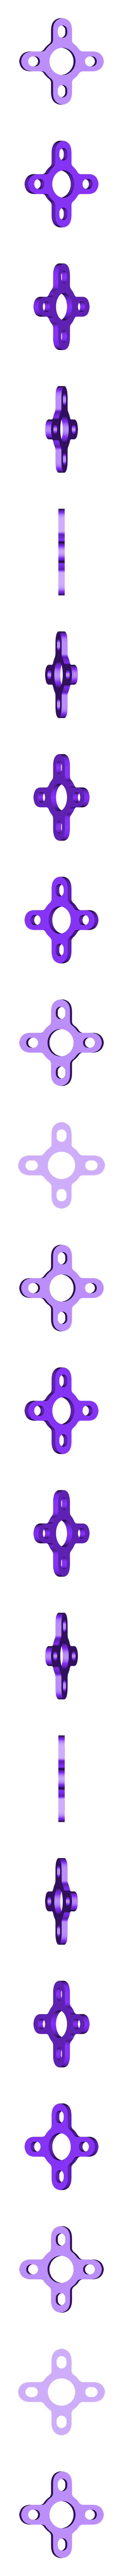 14xx-13XX_Soft_Mount_Pad.stl Download free STL file 11XX 22XX 14XX 13XX TPU Soft Mount Pads Quadcopter Vibration Dampener Every Size • 3D printing design, BananaScience